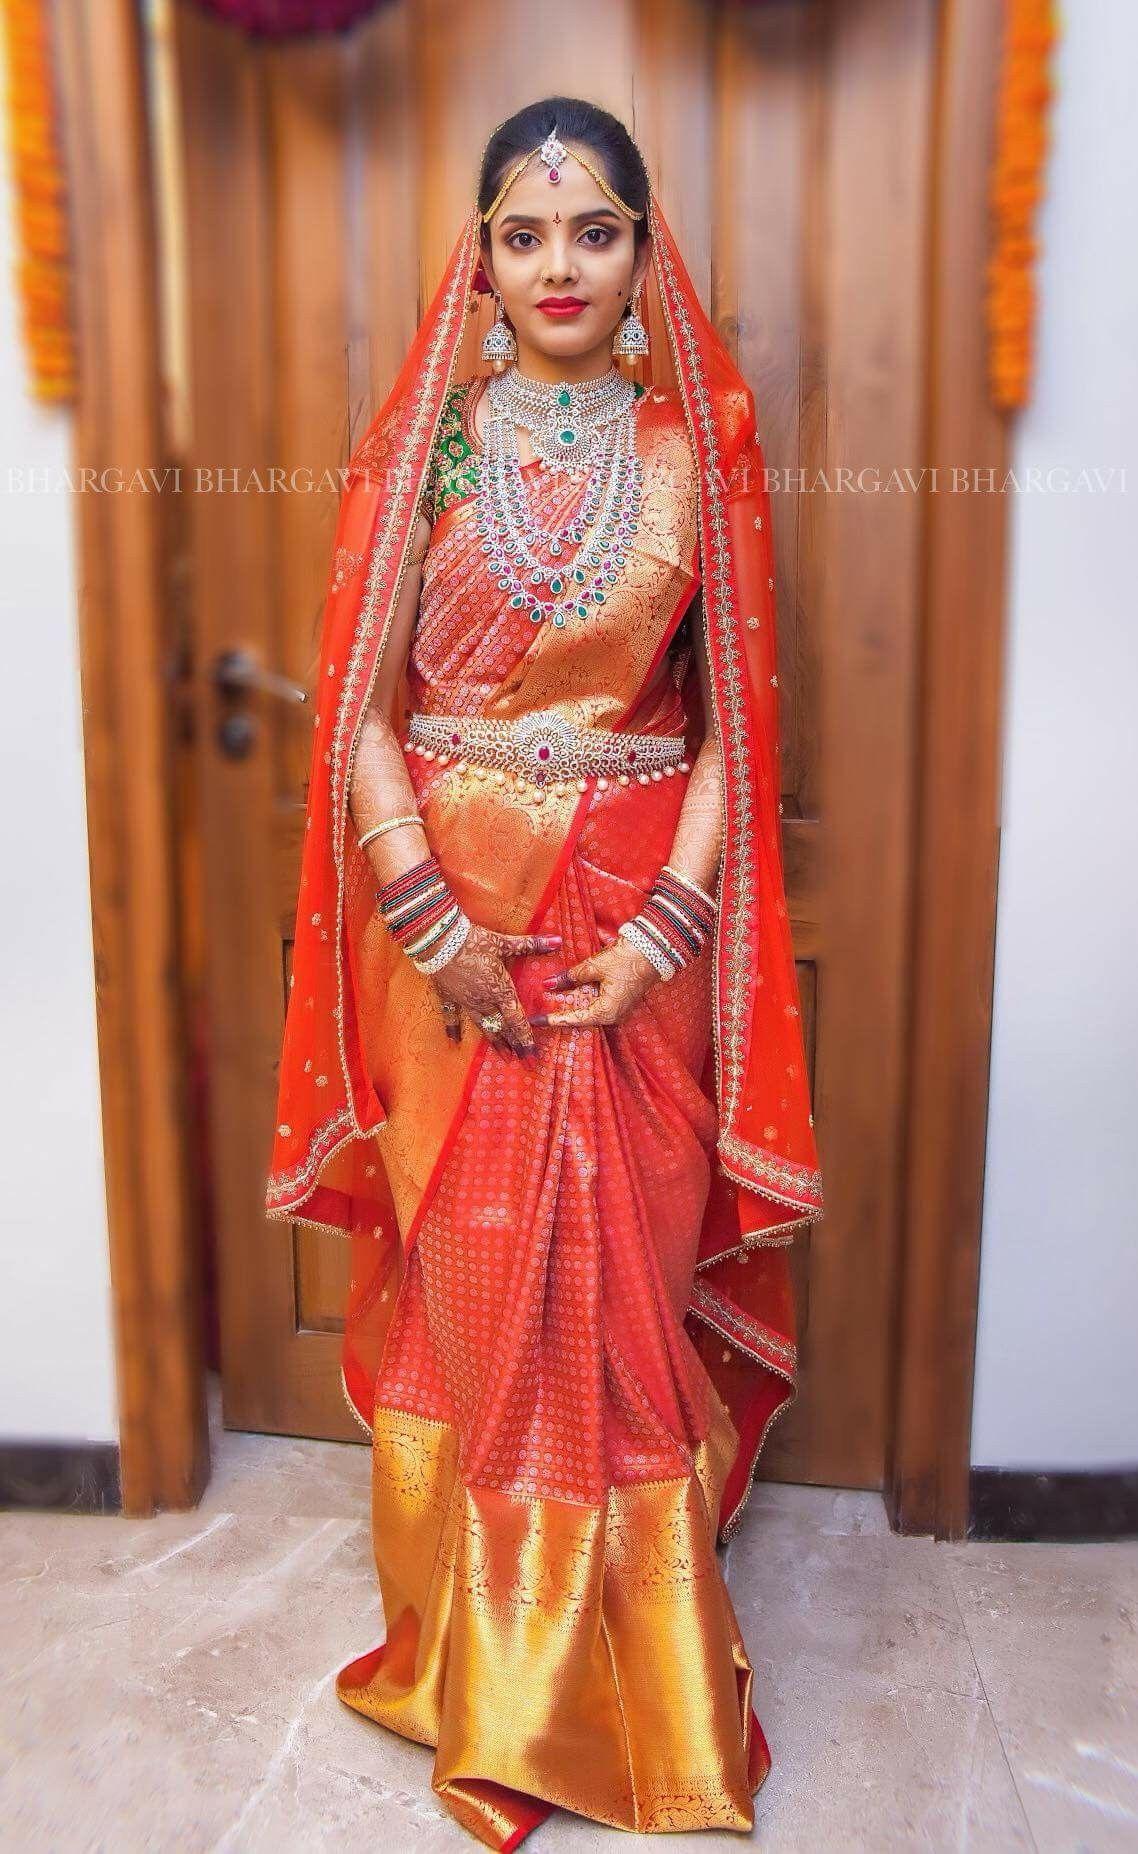 d84d690e07a5f Diamond Choker Jewelry Red Saree Sari Traditional Sarees Bridal Sets